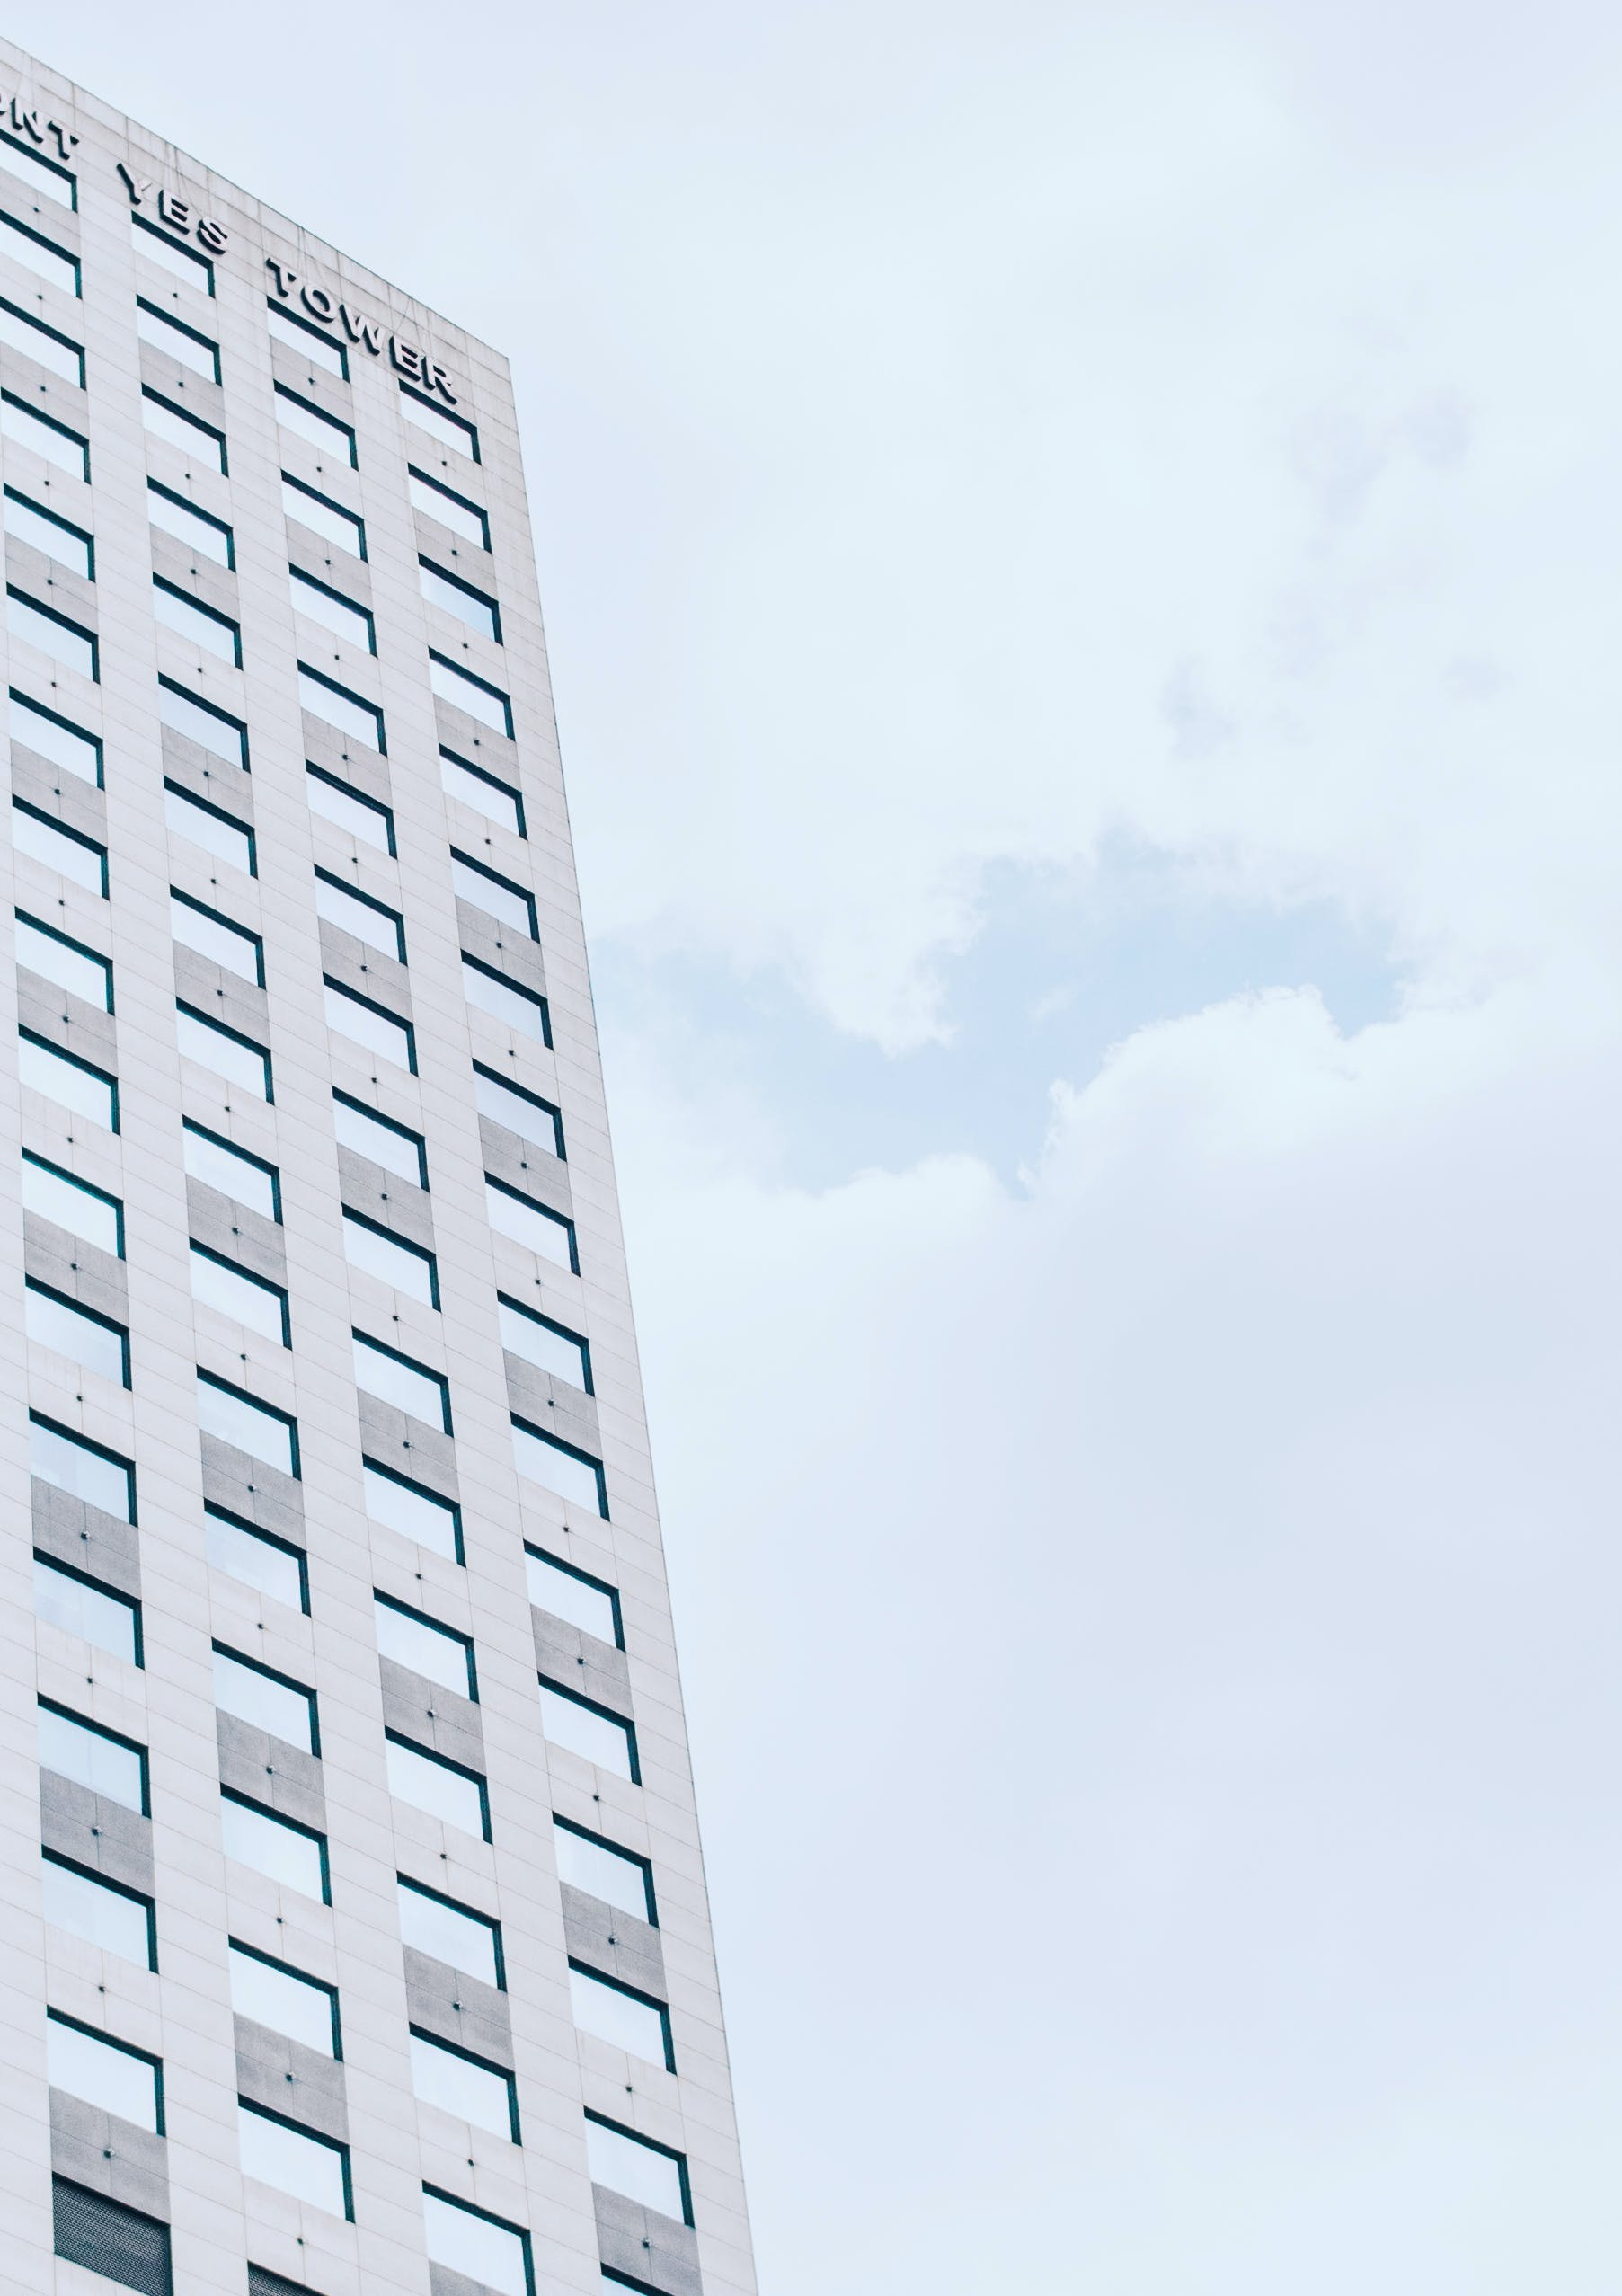 Free stock photo of building, cloud, diagonal, diagonal lines